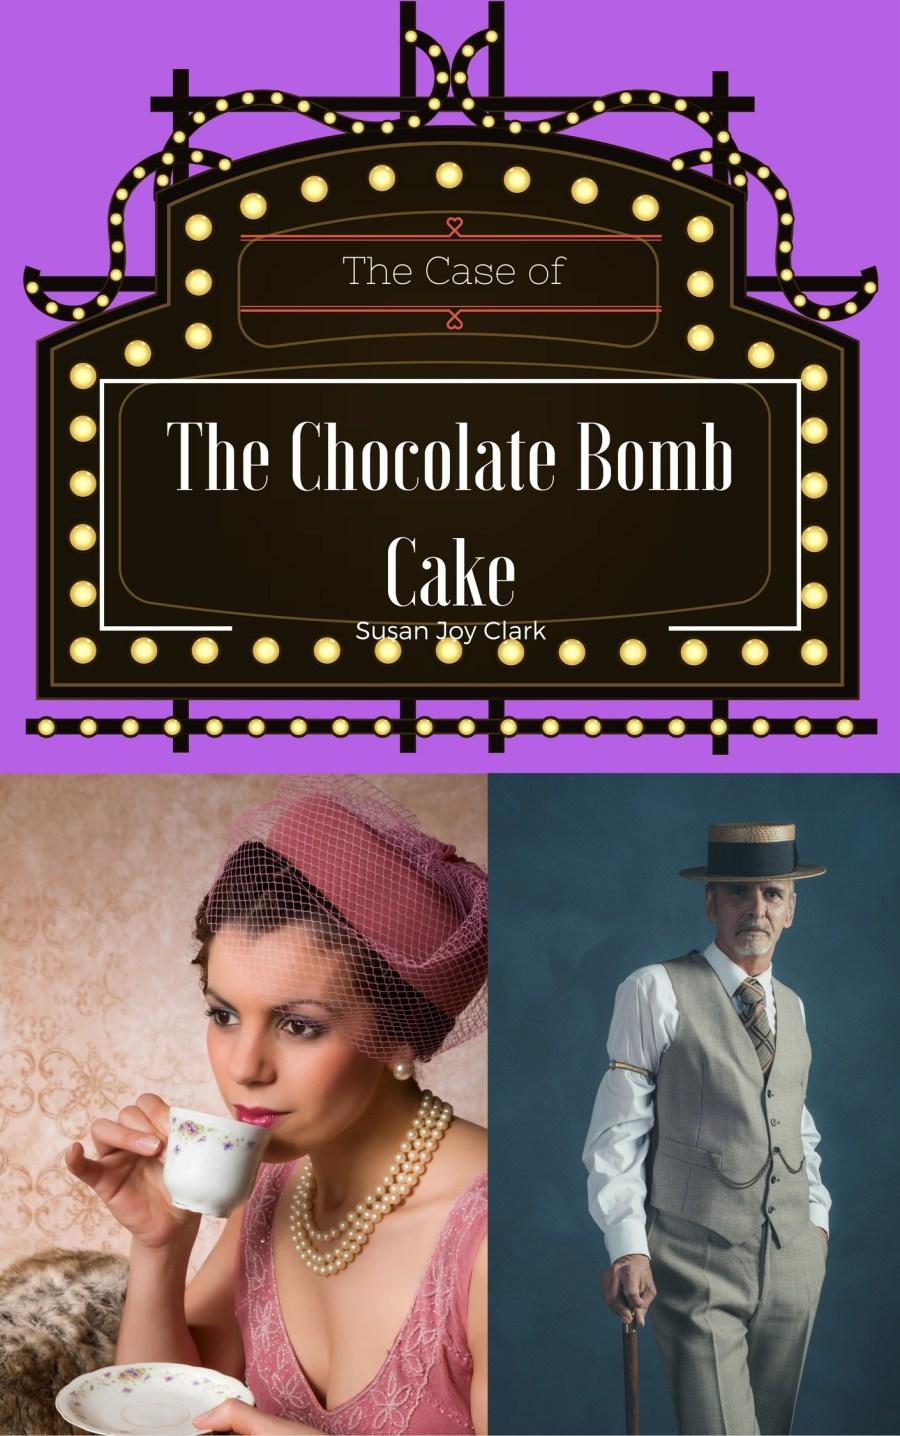 The Chocolate Bomb Cake